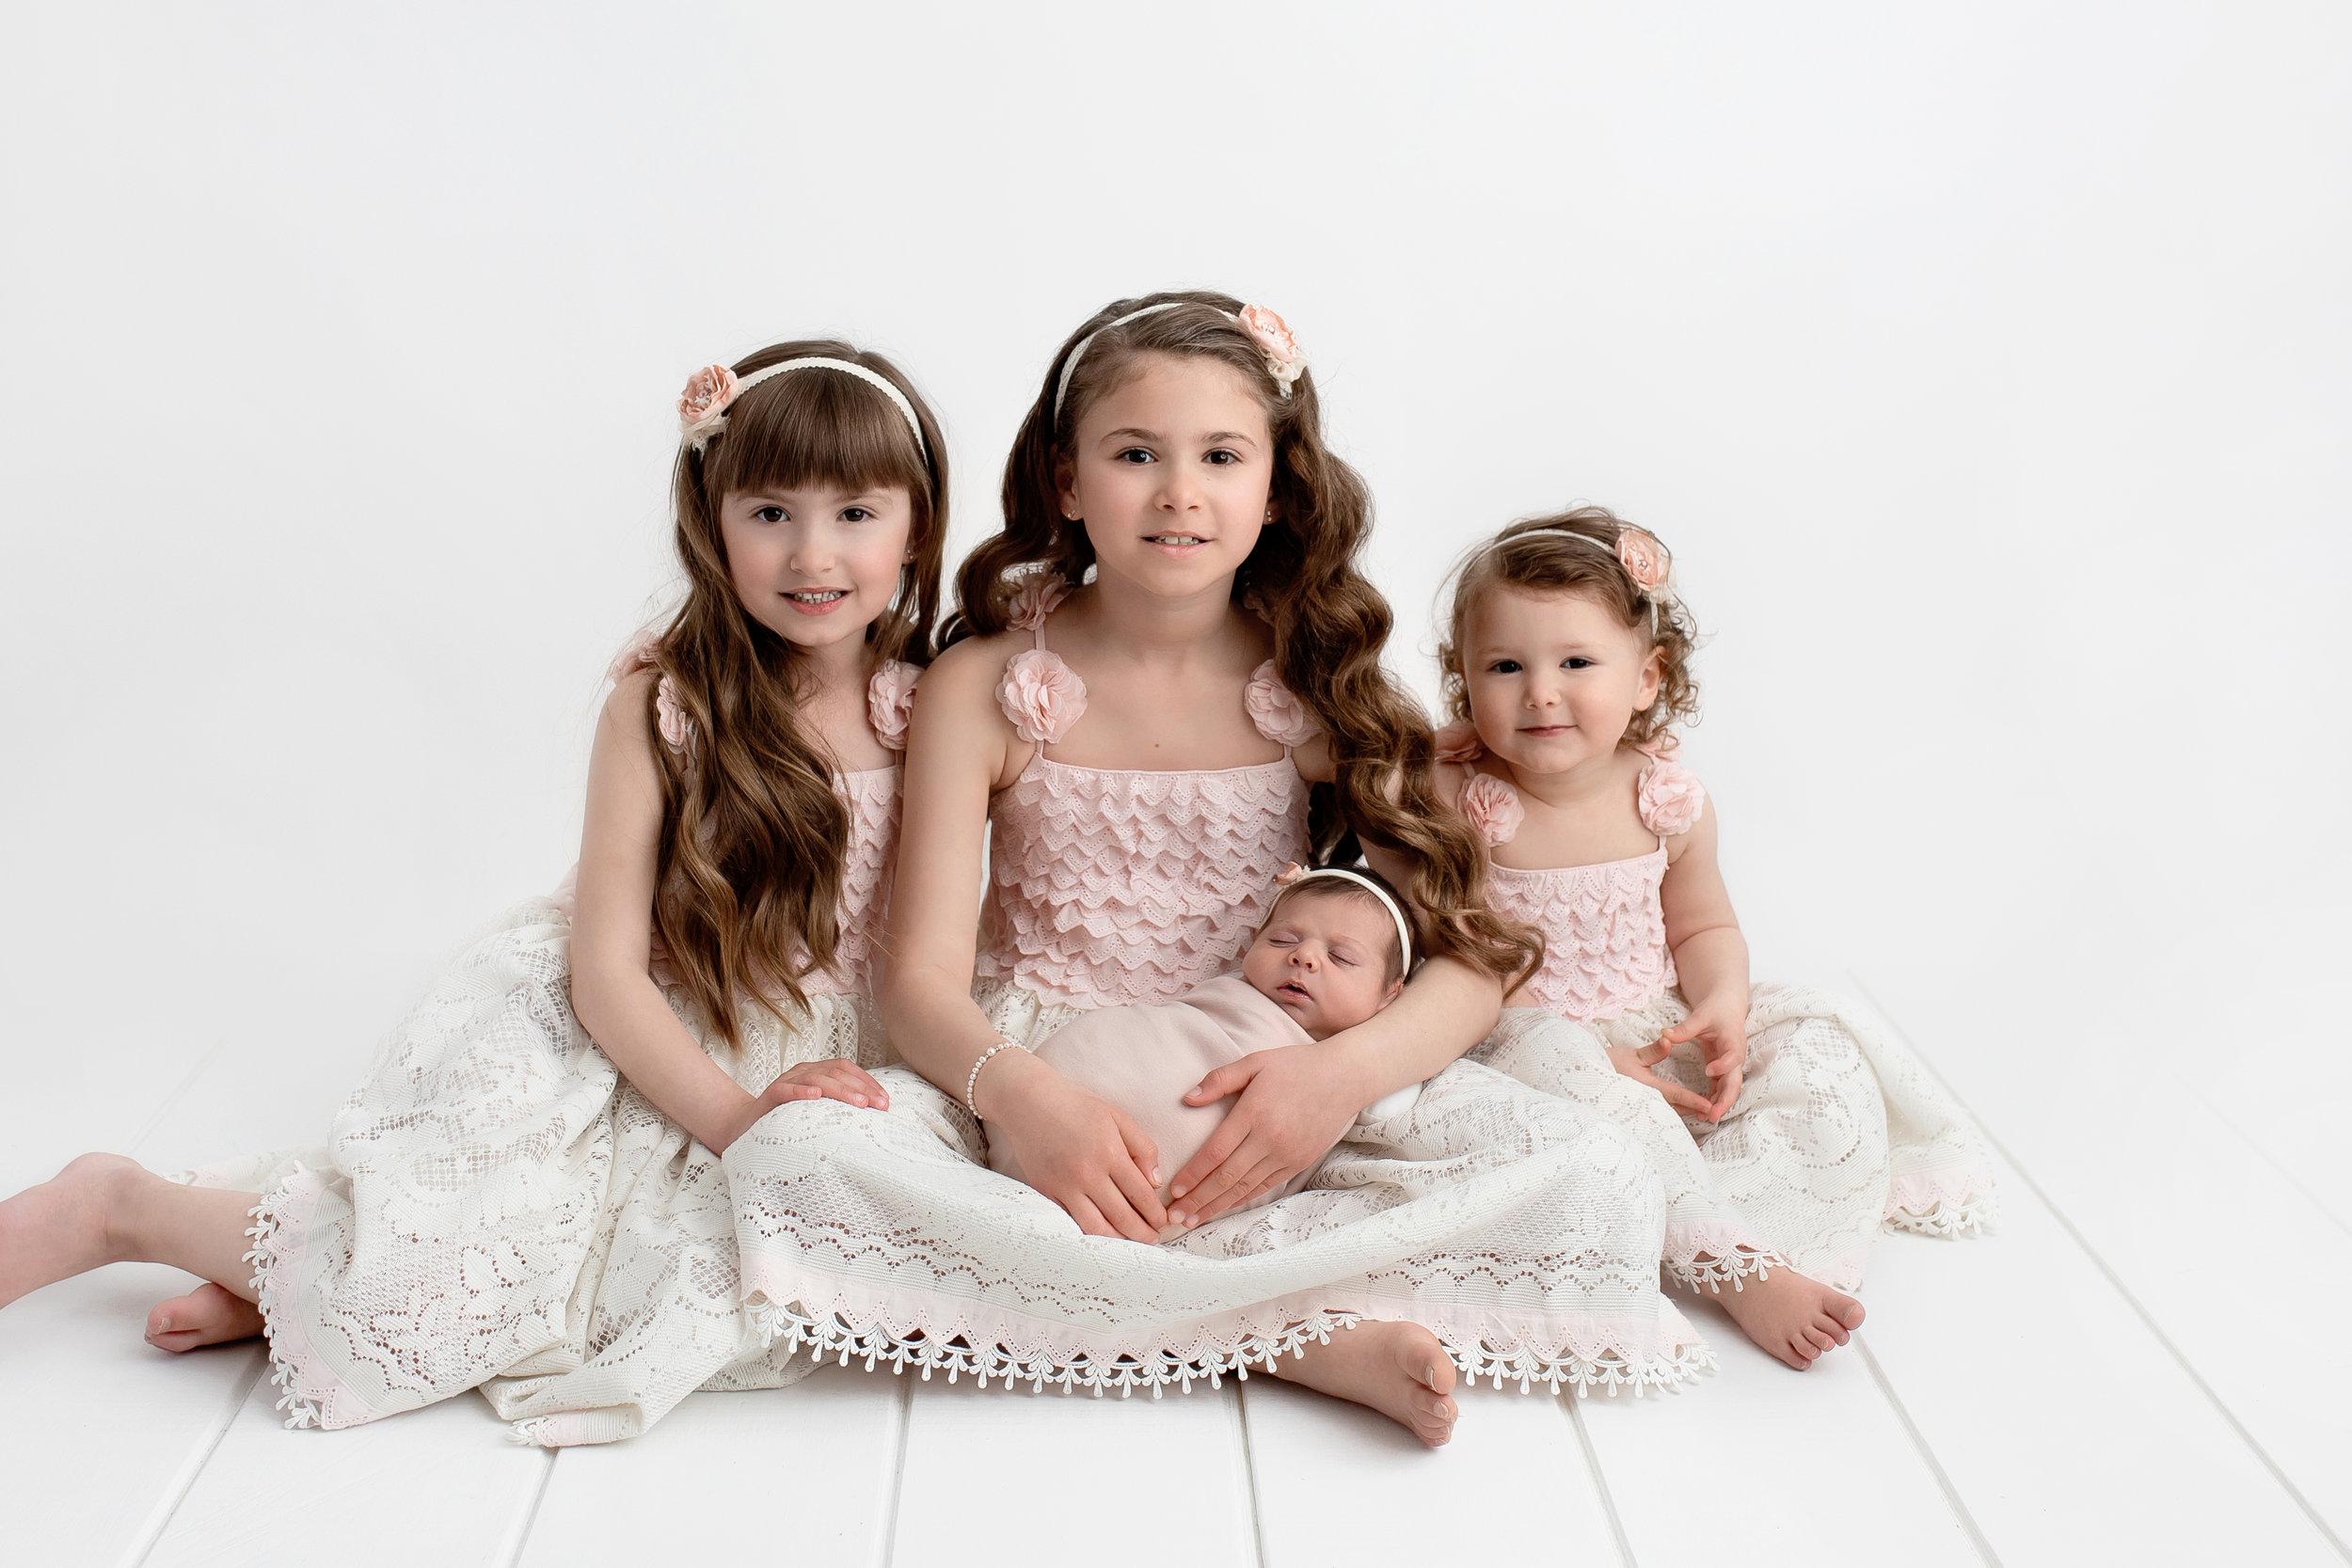 best baby photography edmonton newborn photoshoot st-albert baby photo session edmonton blooming bliss photography